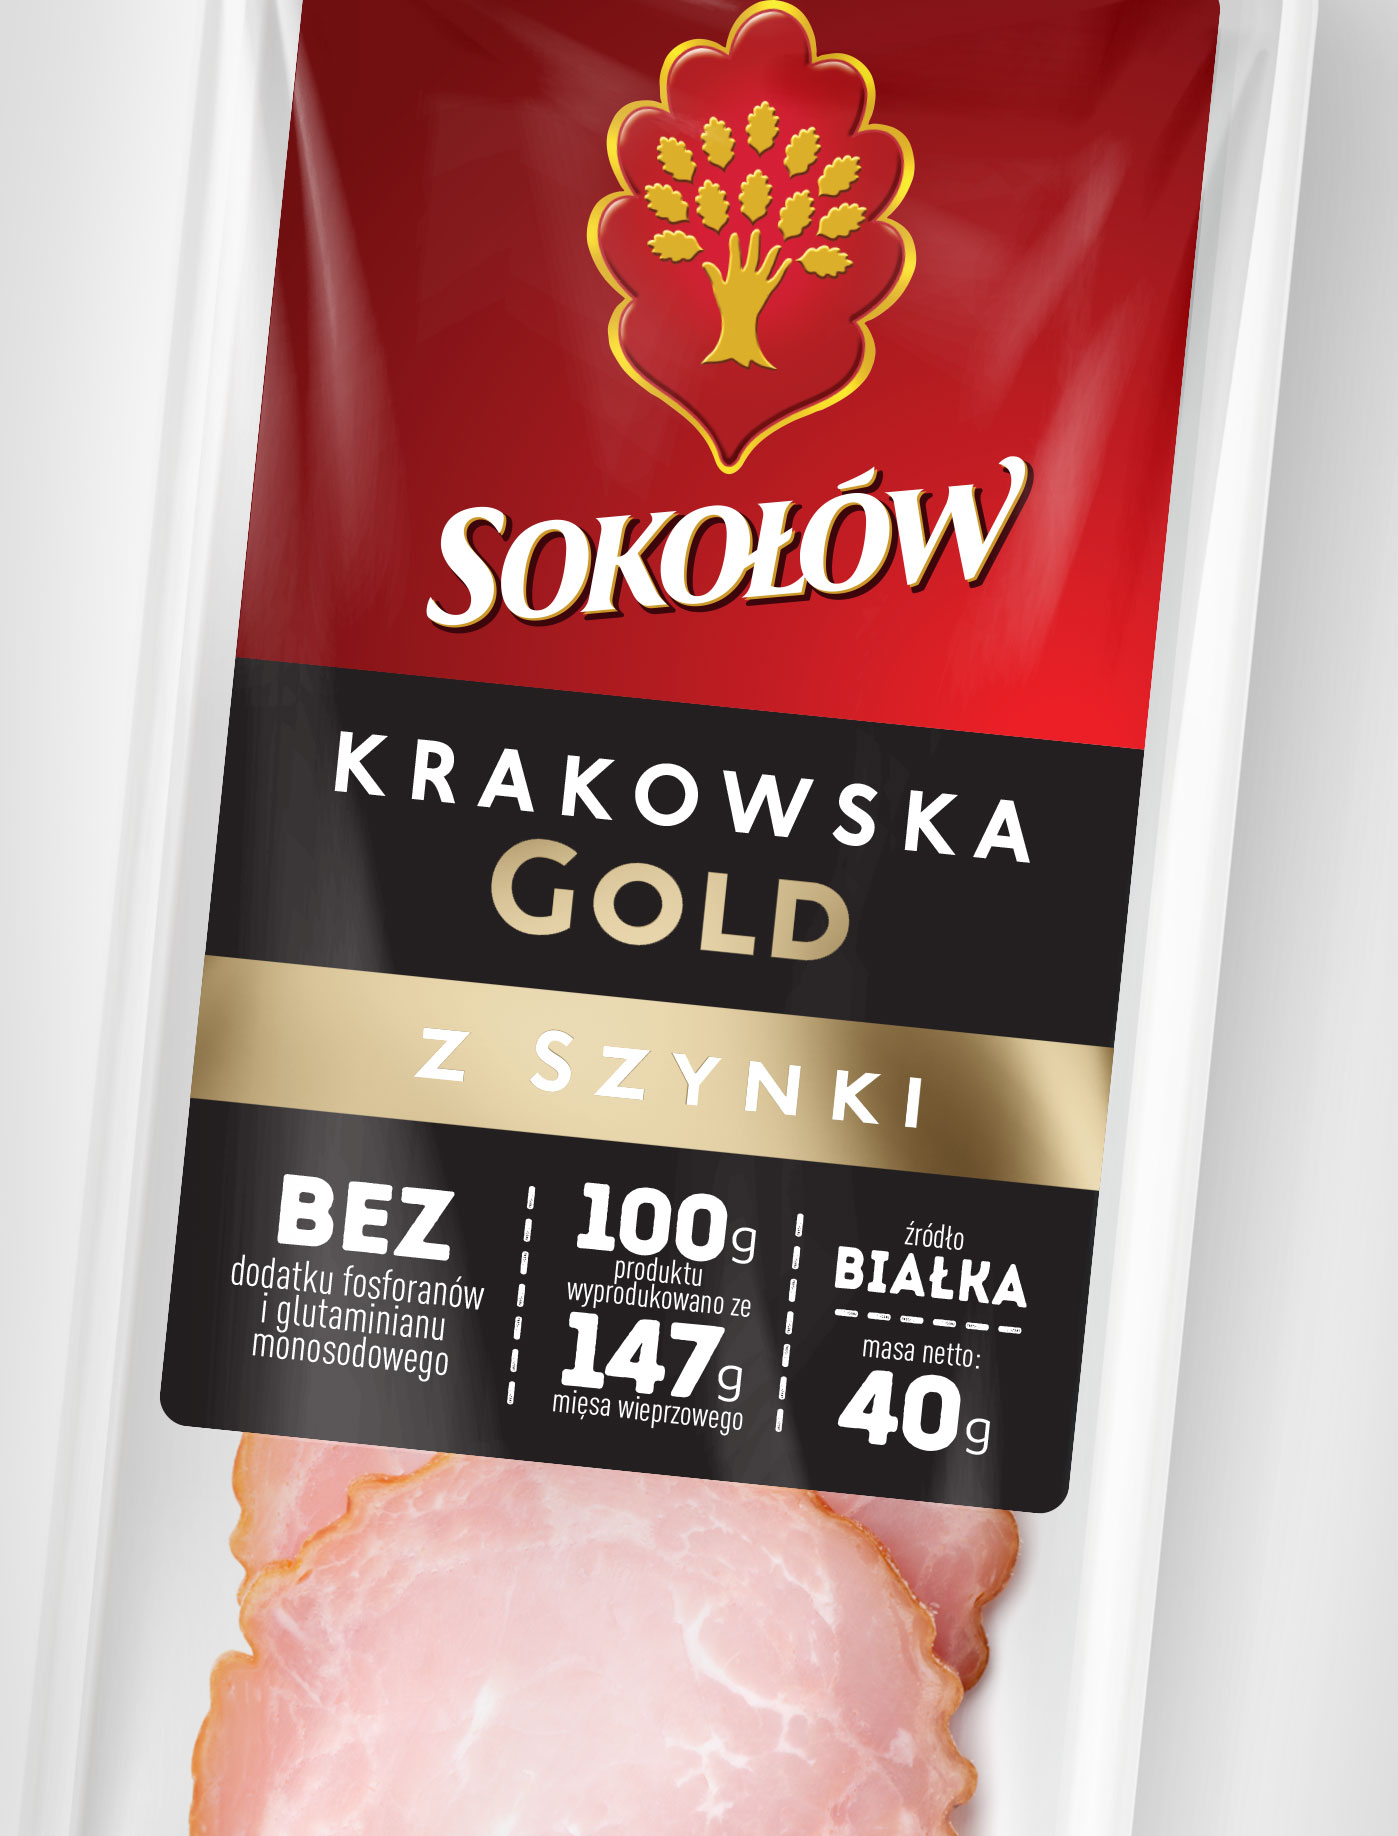 sokołów krakowska gold - agencjadba.pl